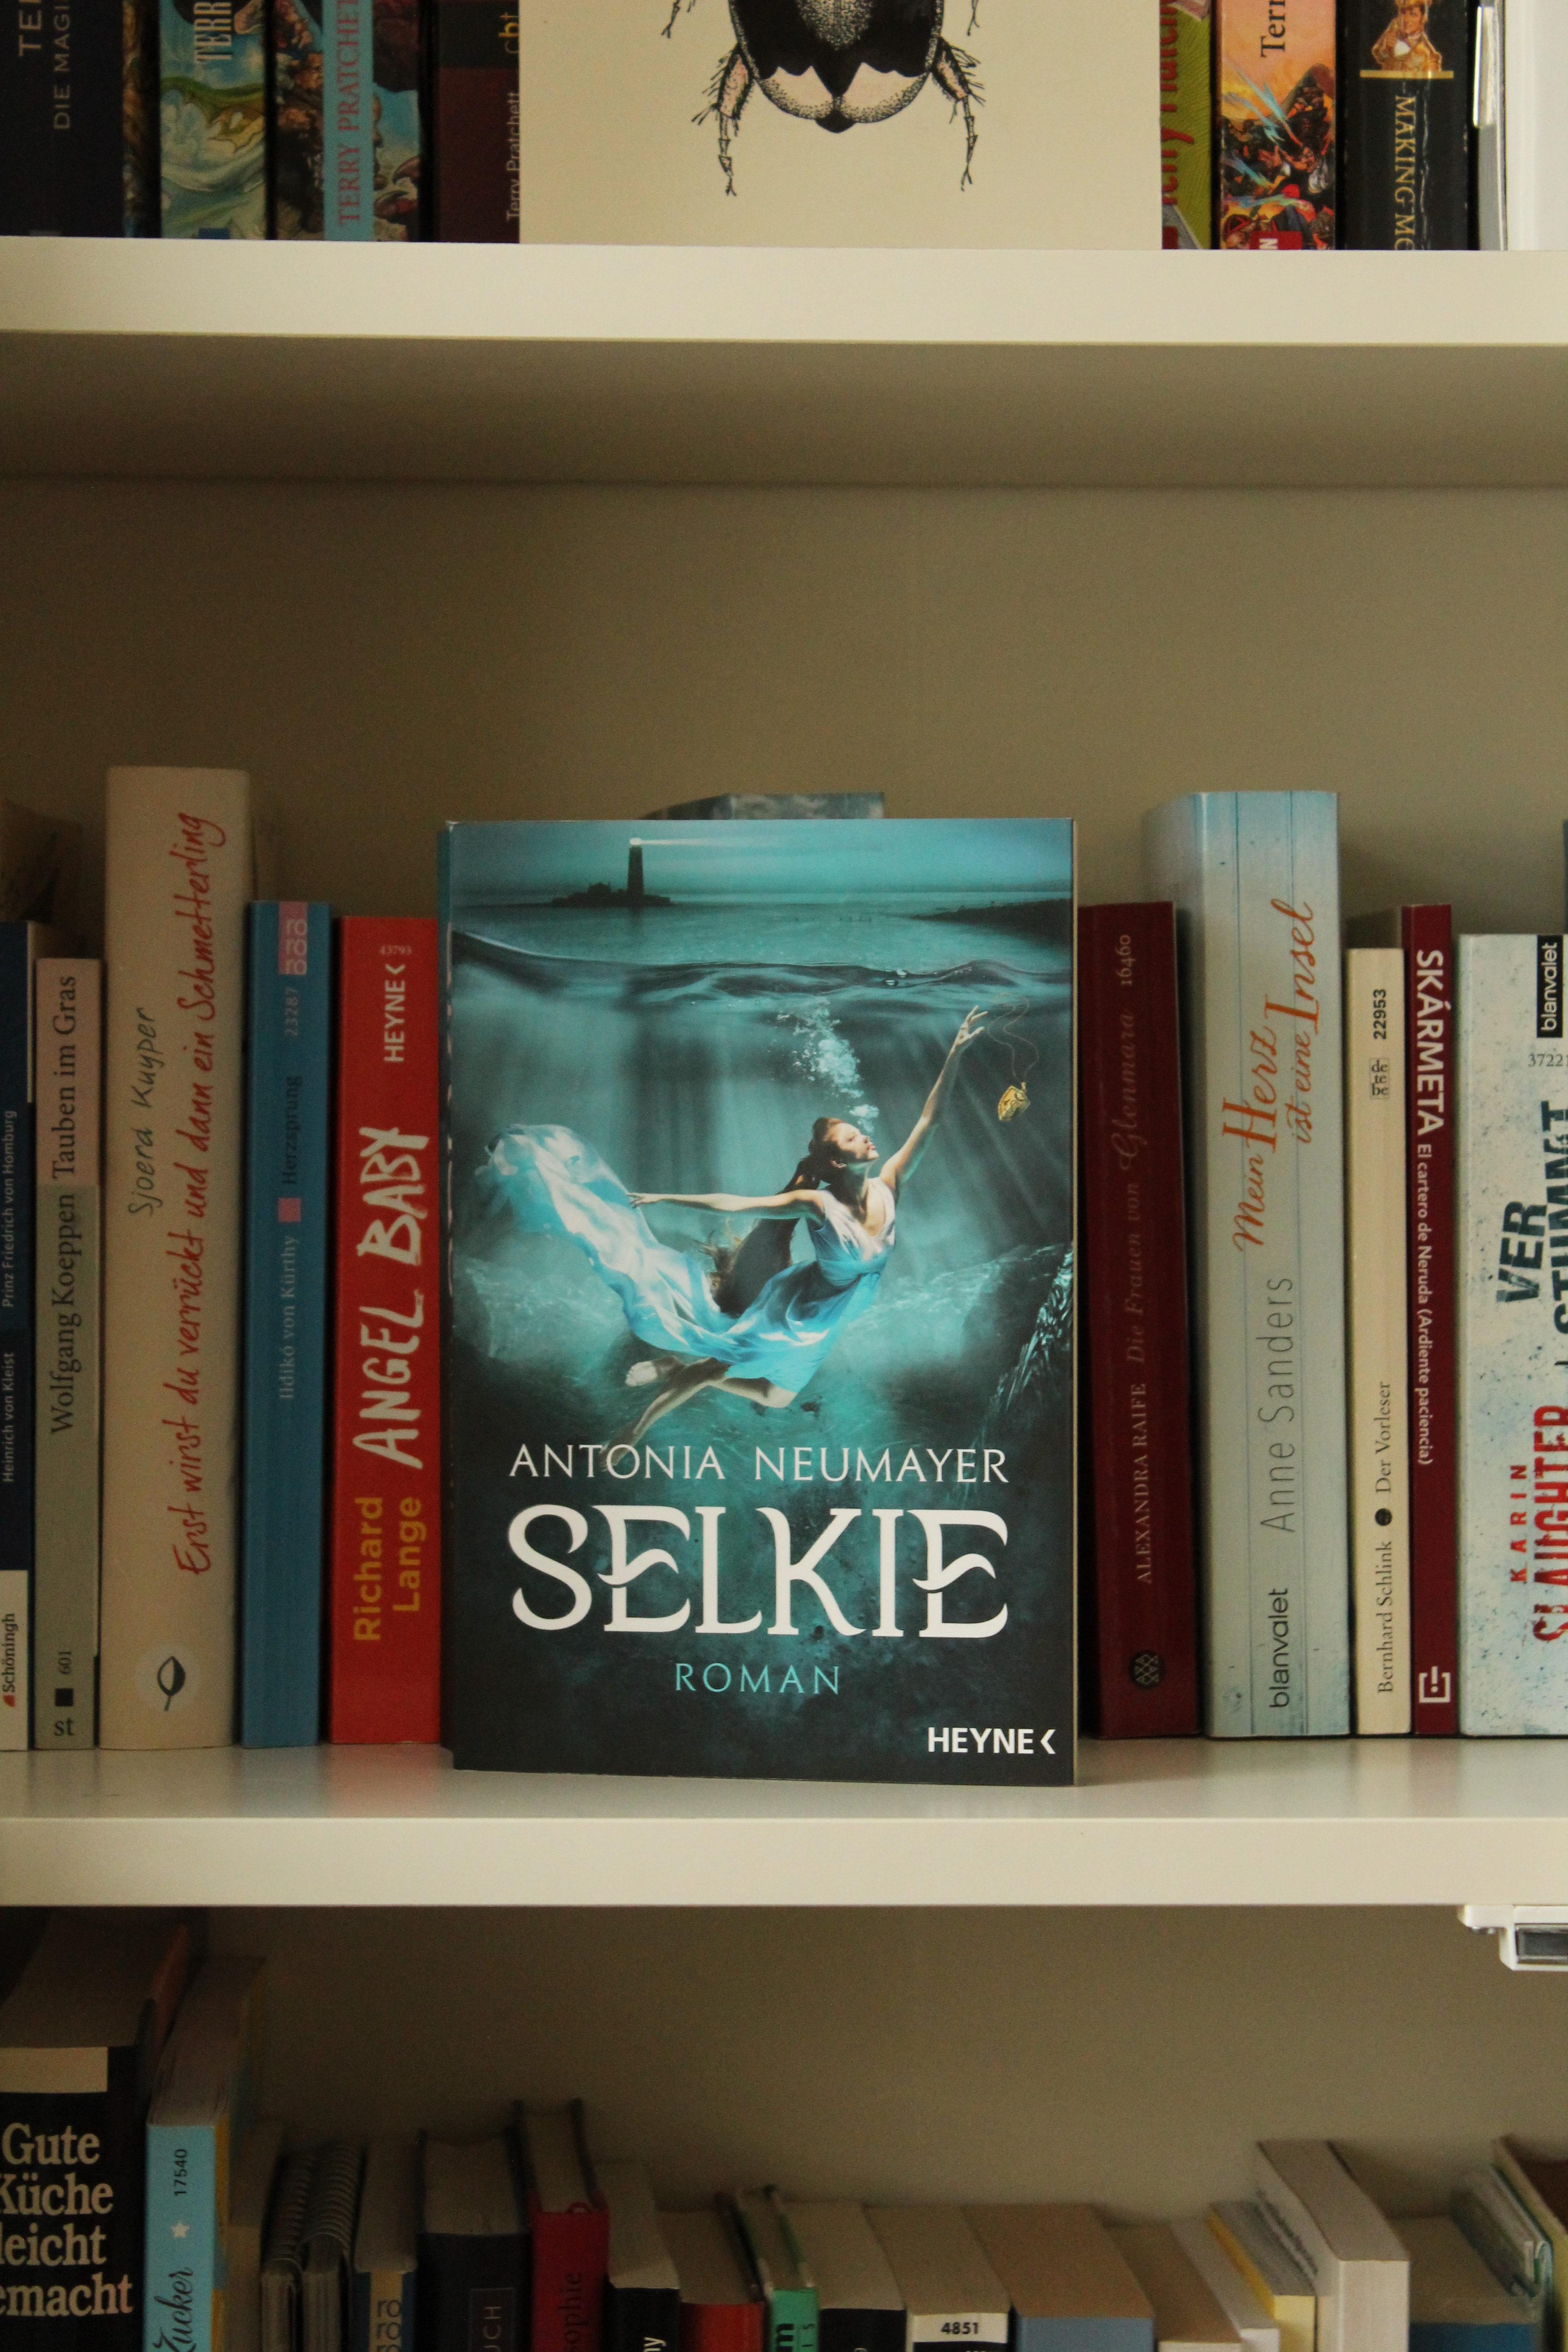 Selkie, Antonia Neumayer